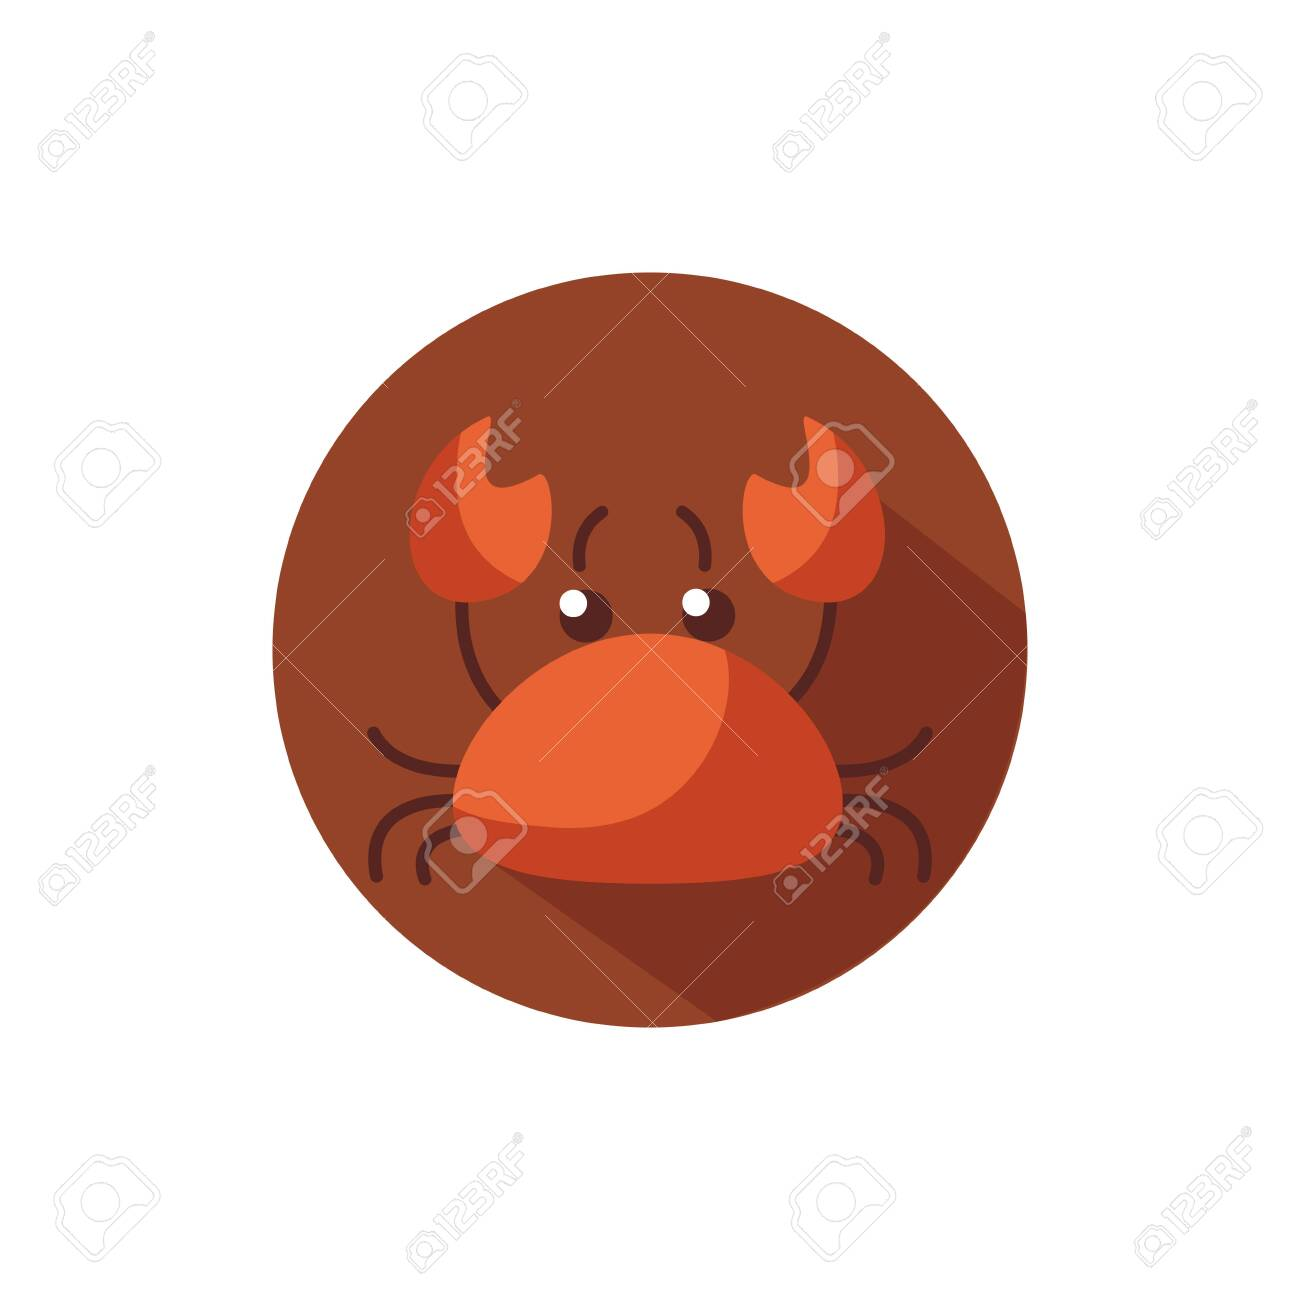 crab sea animal block style icon vector illustration design - 151260635